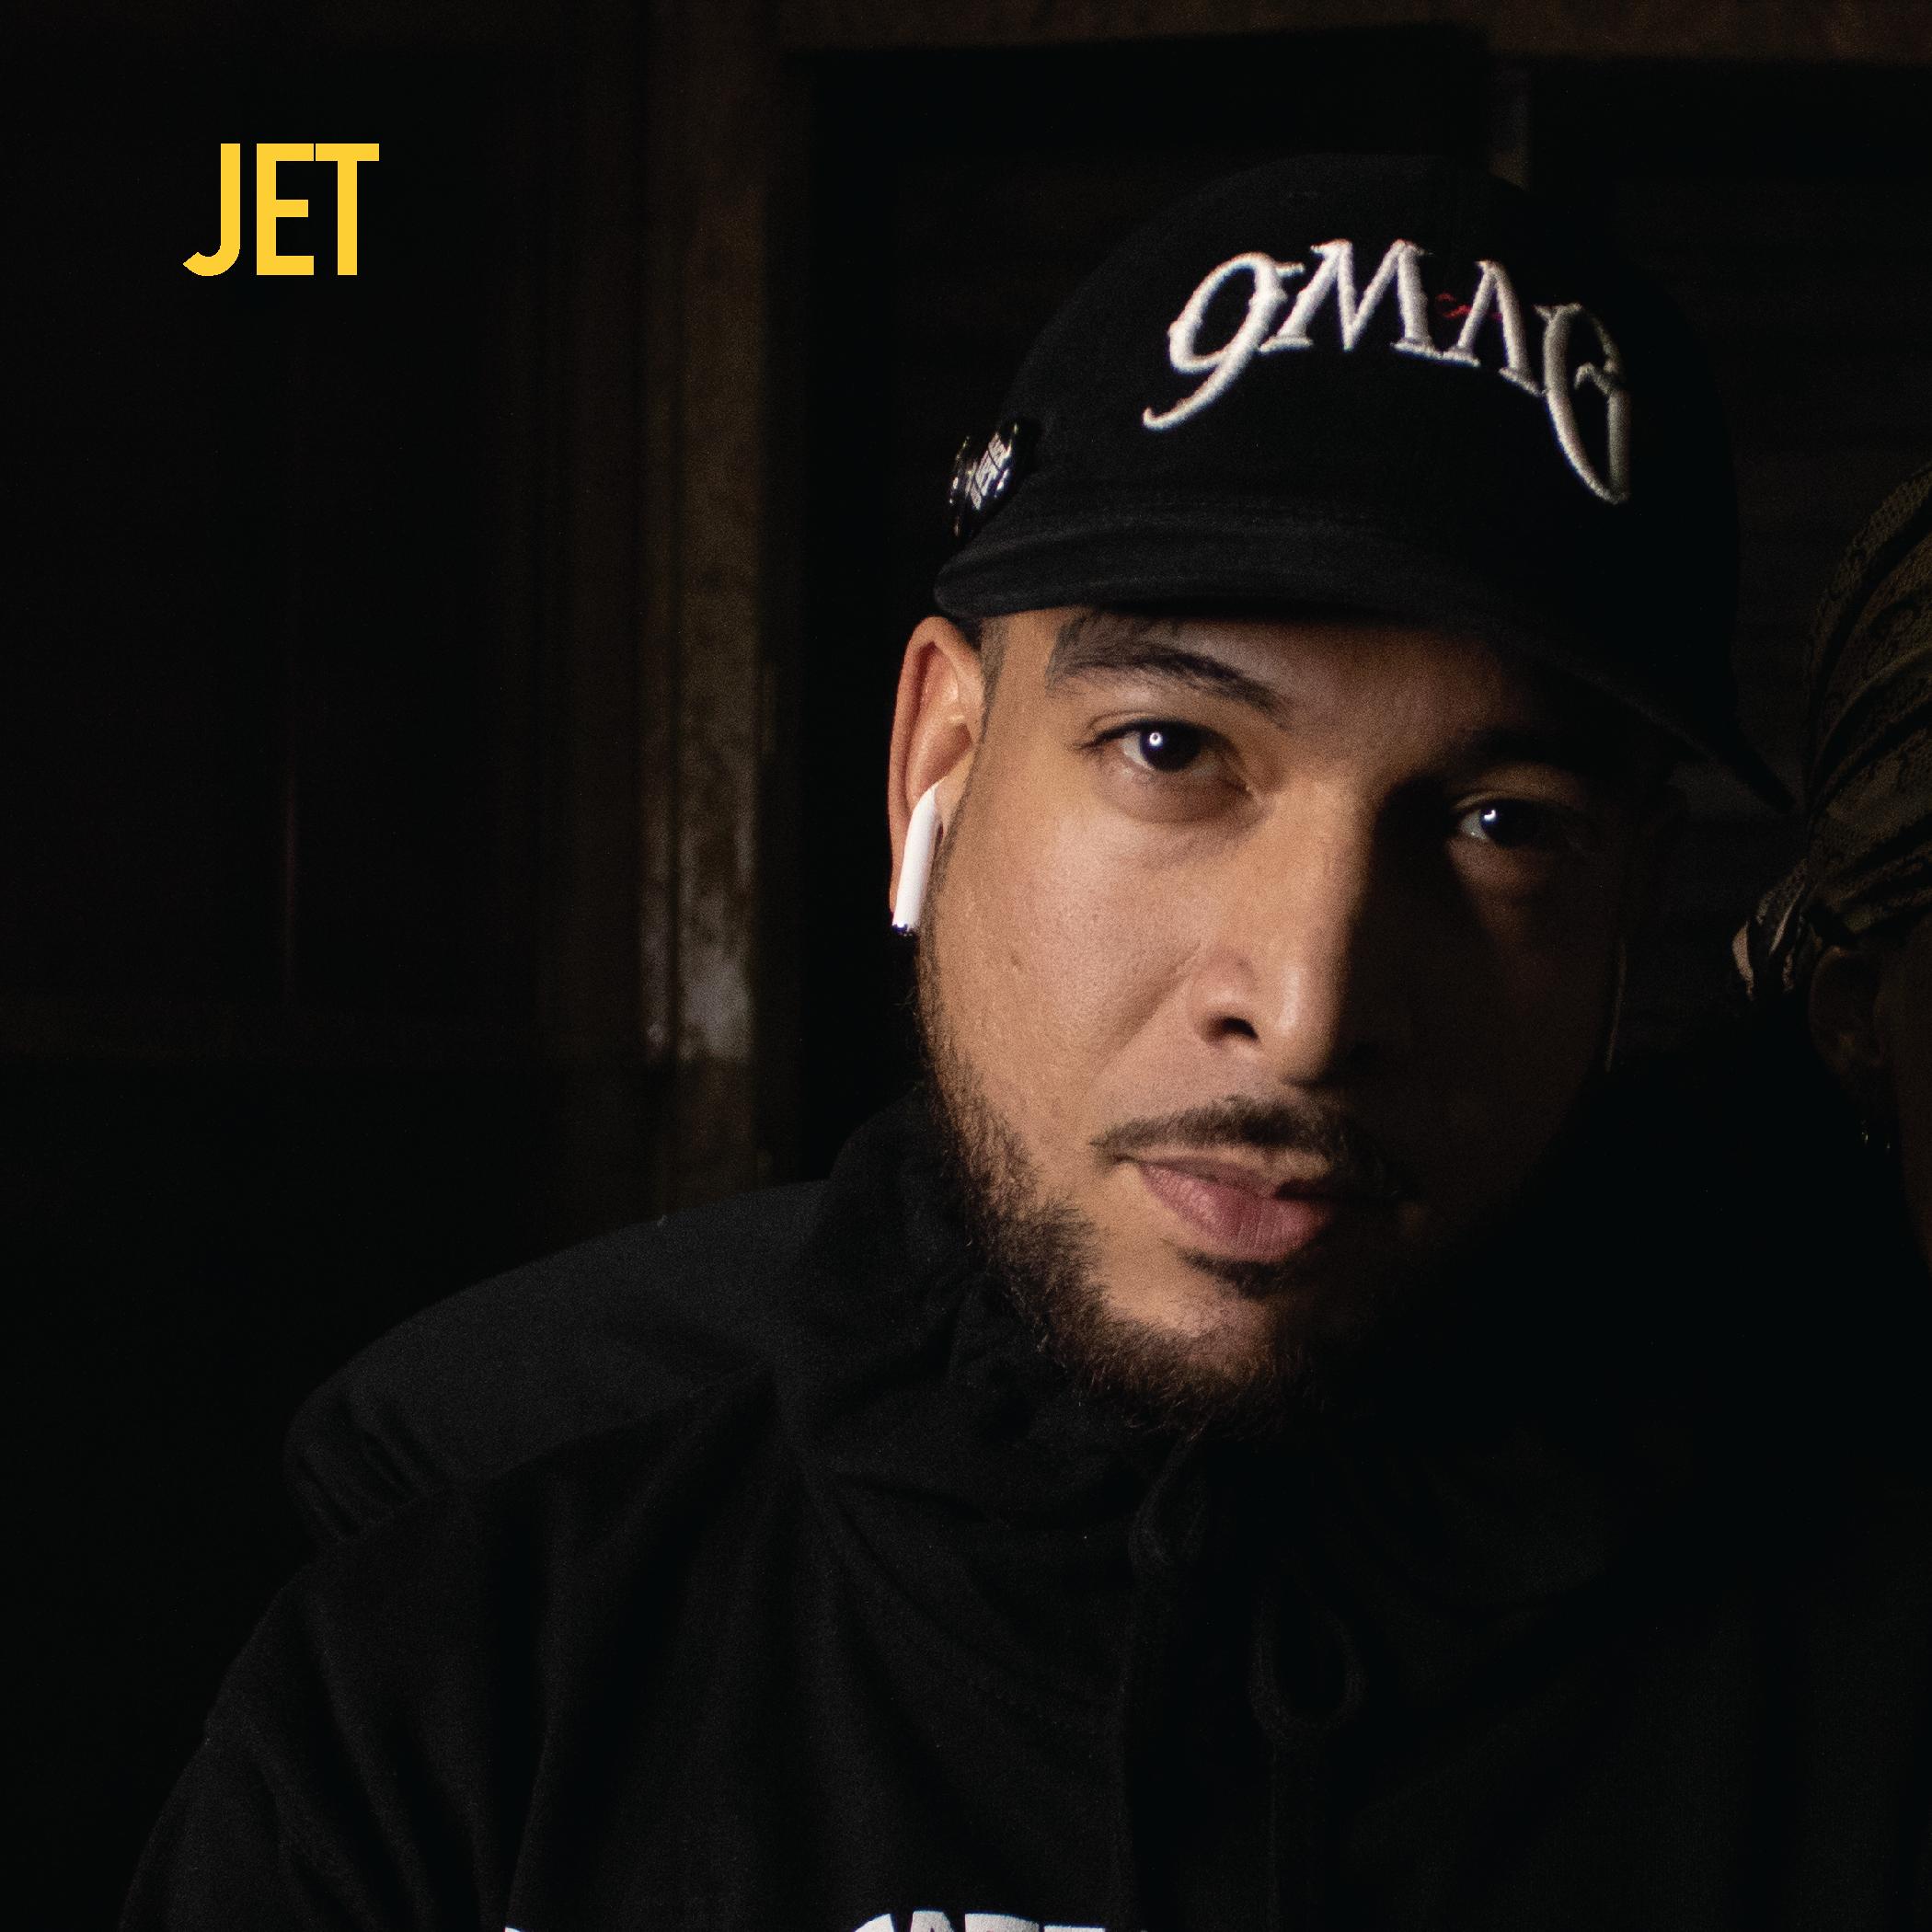 jet_profile-10.png